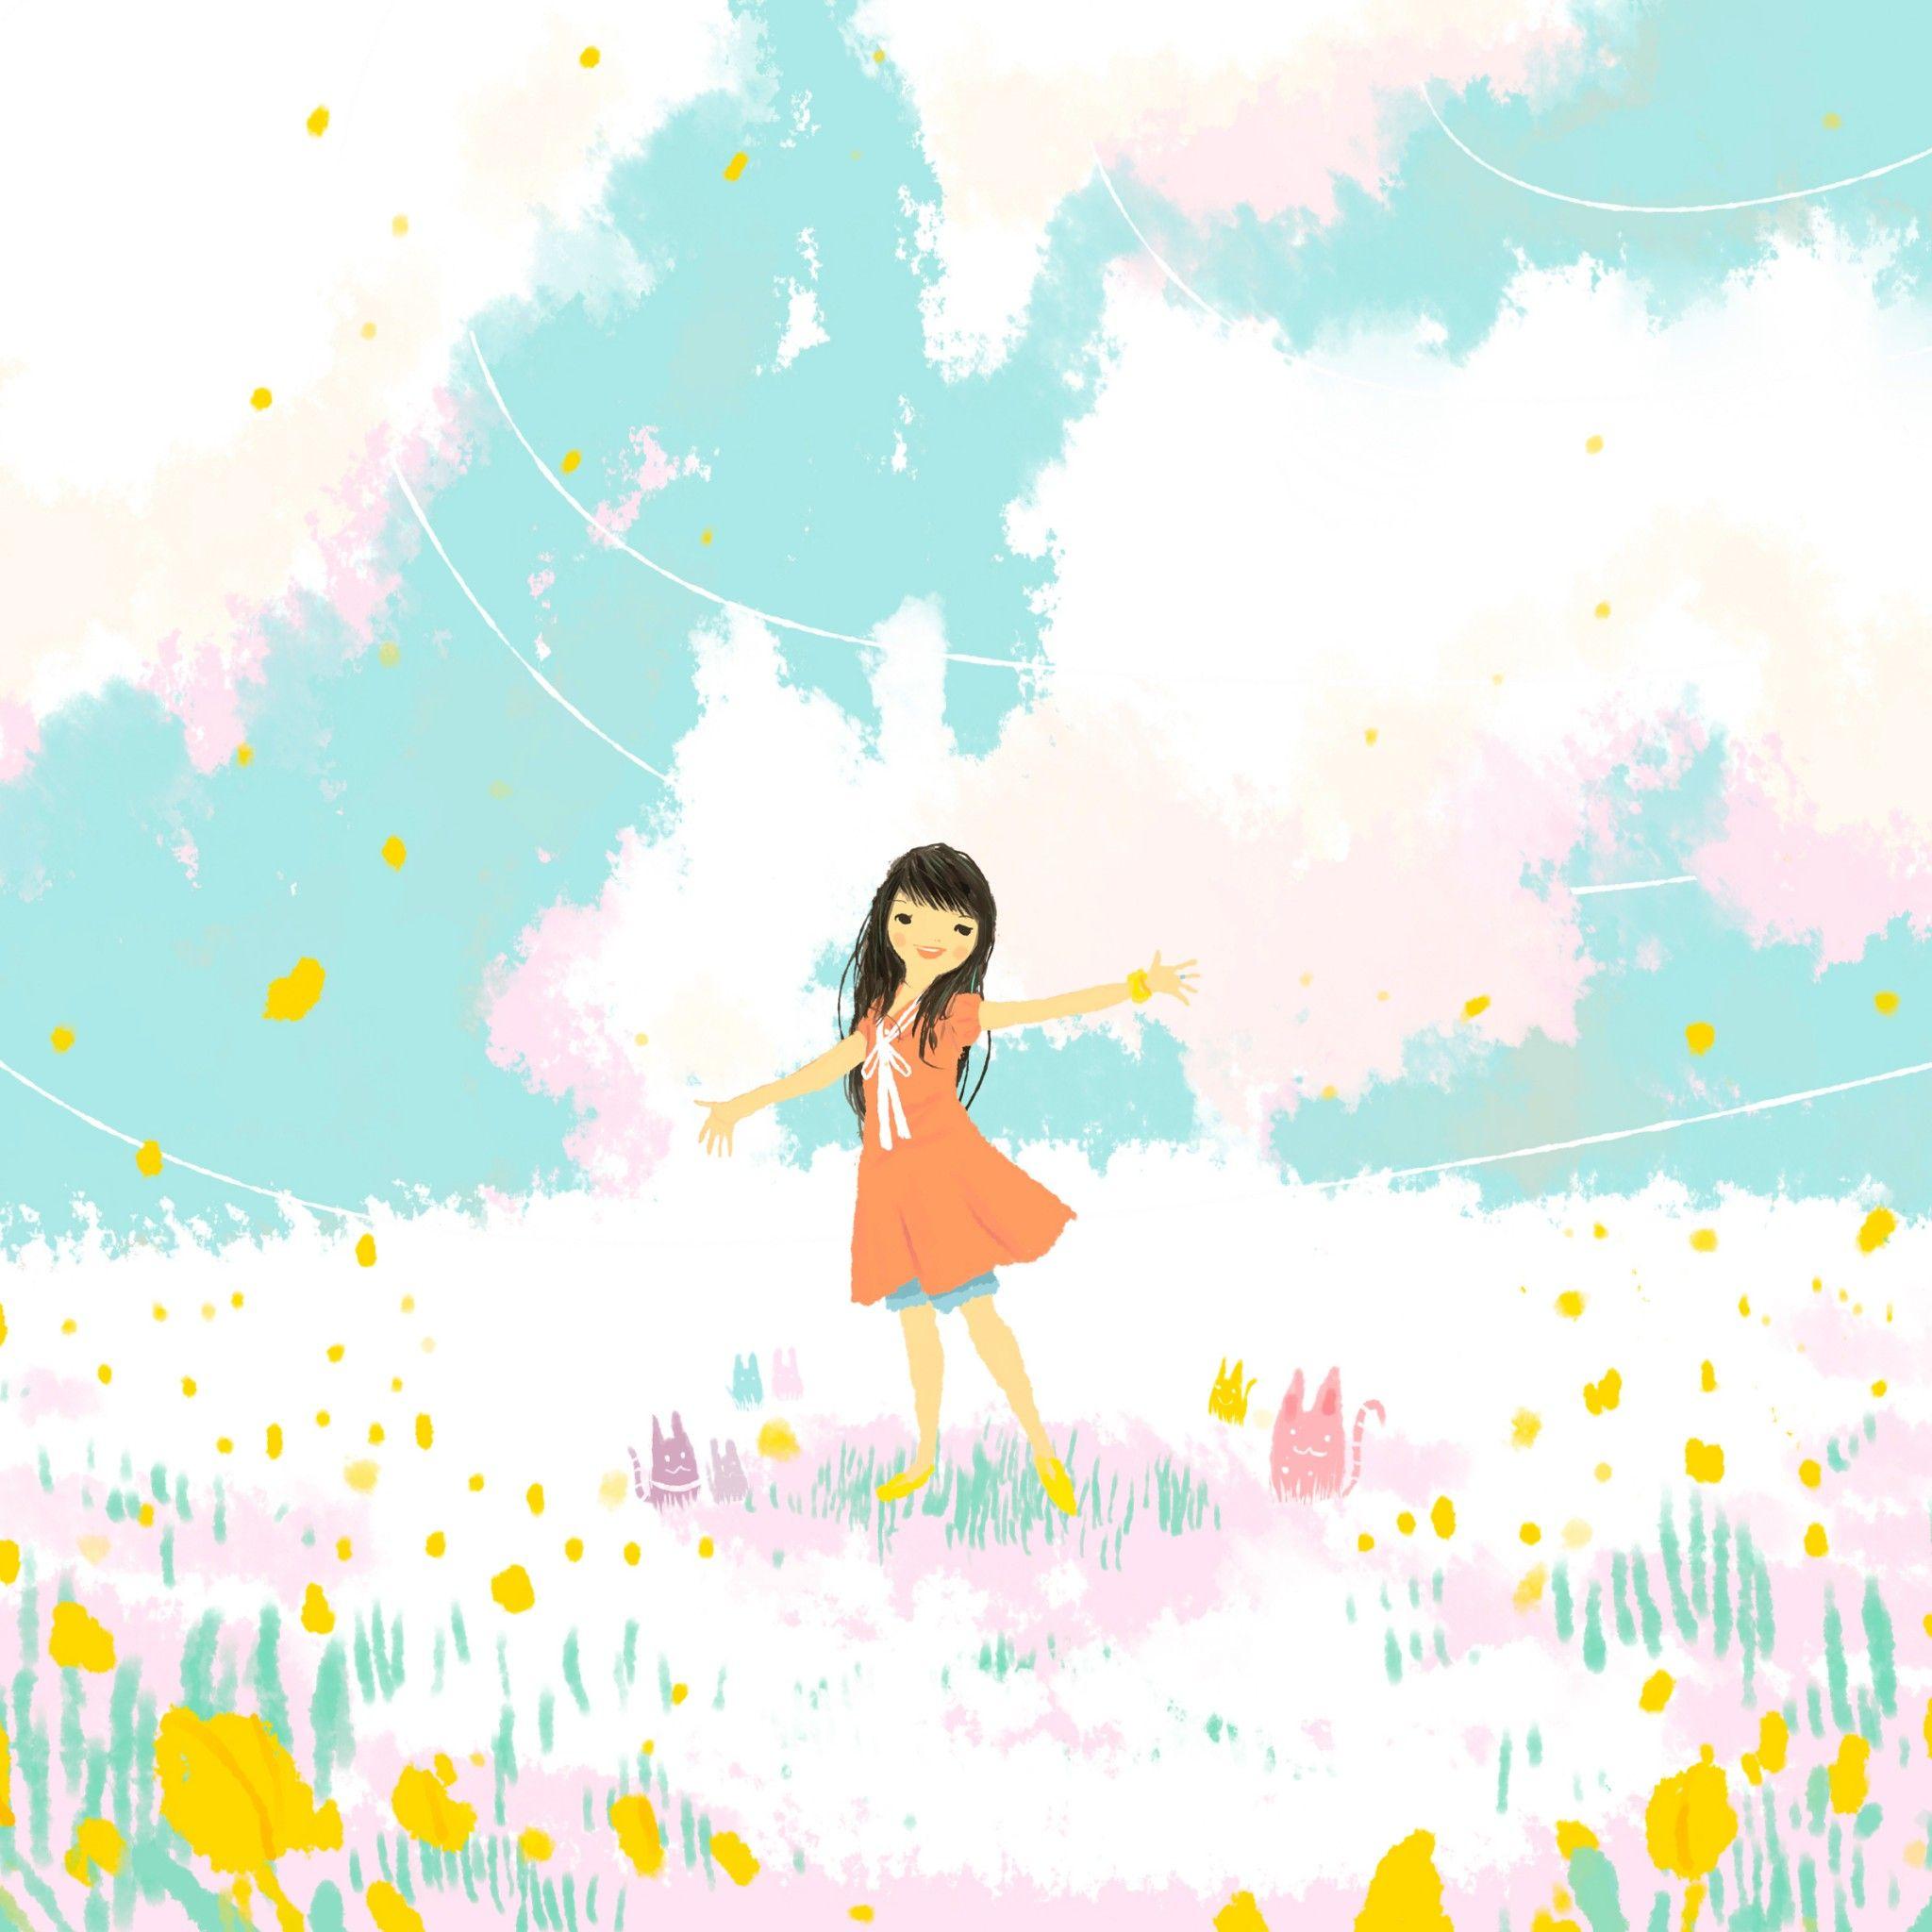 Flower Girl Drawing Wallpaper Cute Cartoon Wallpapers Cartoon Wallpaper